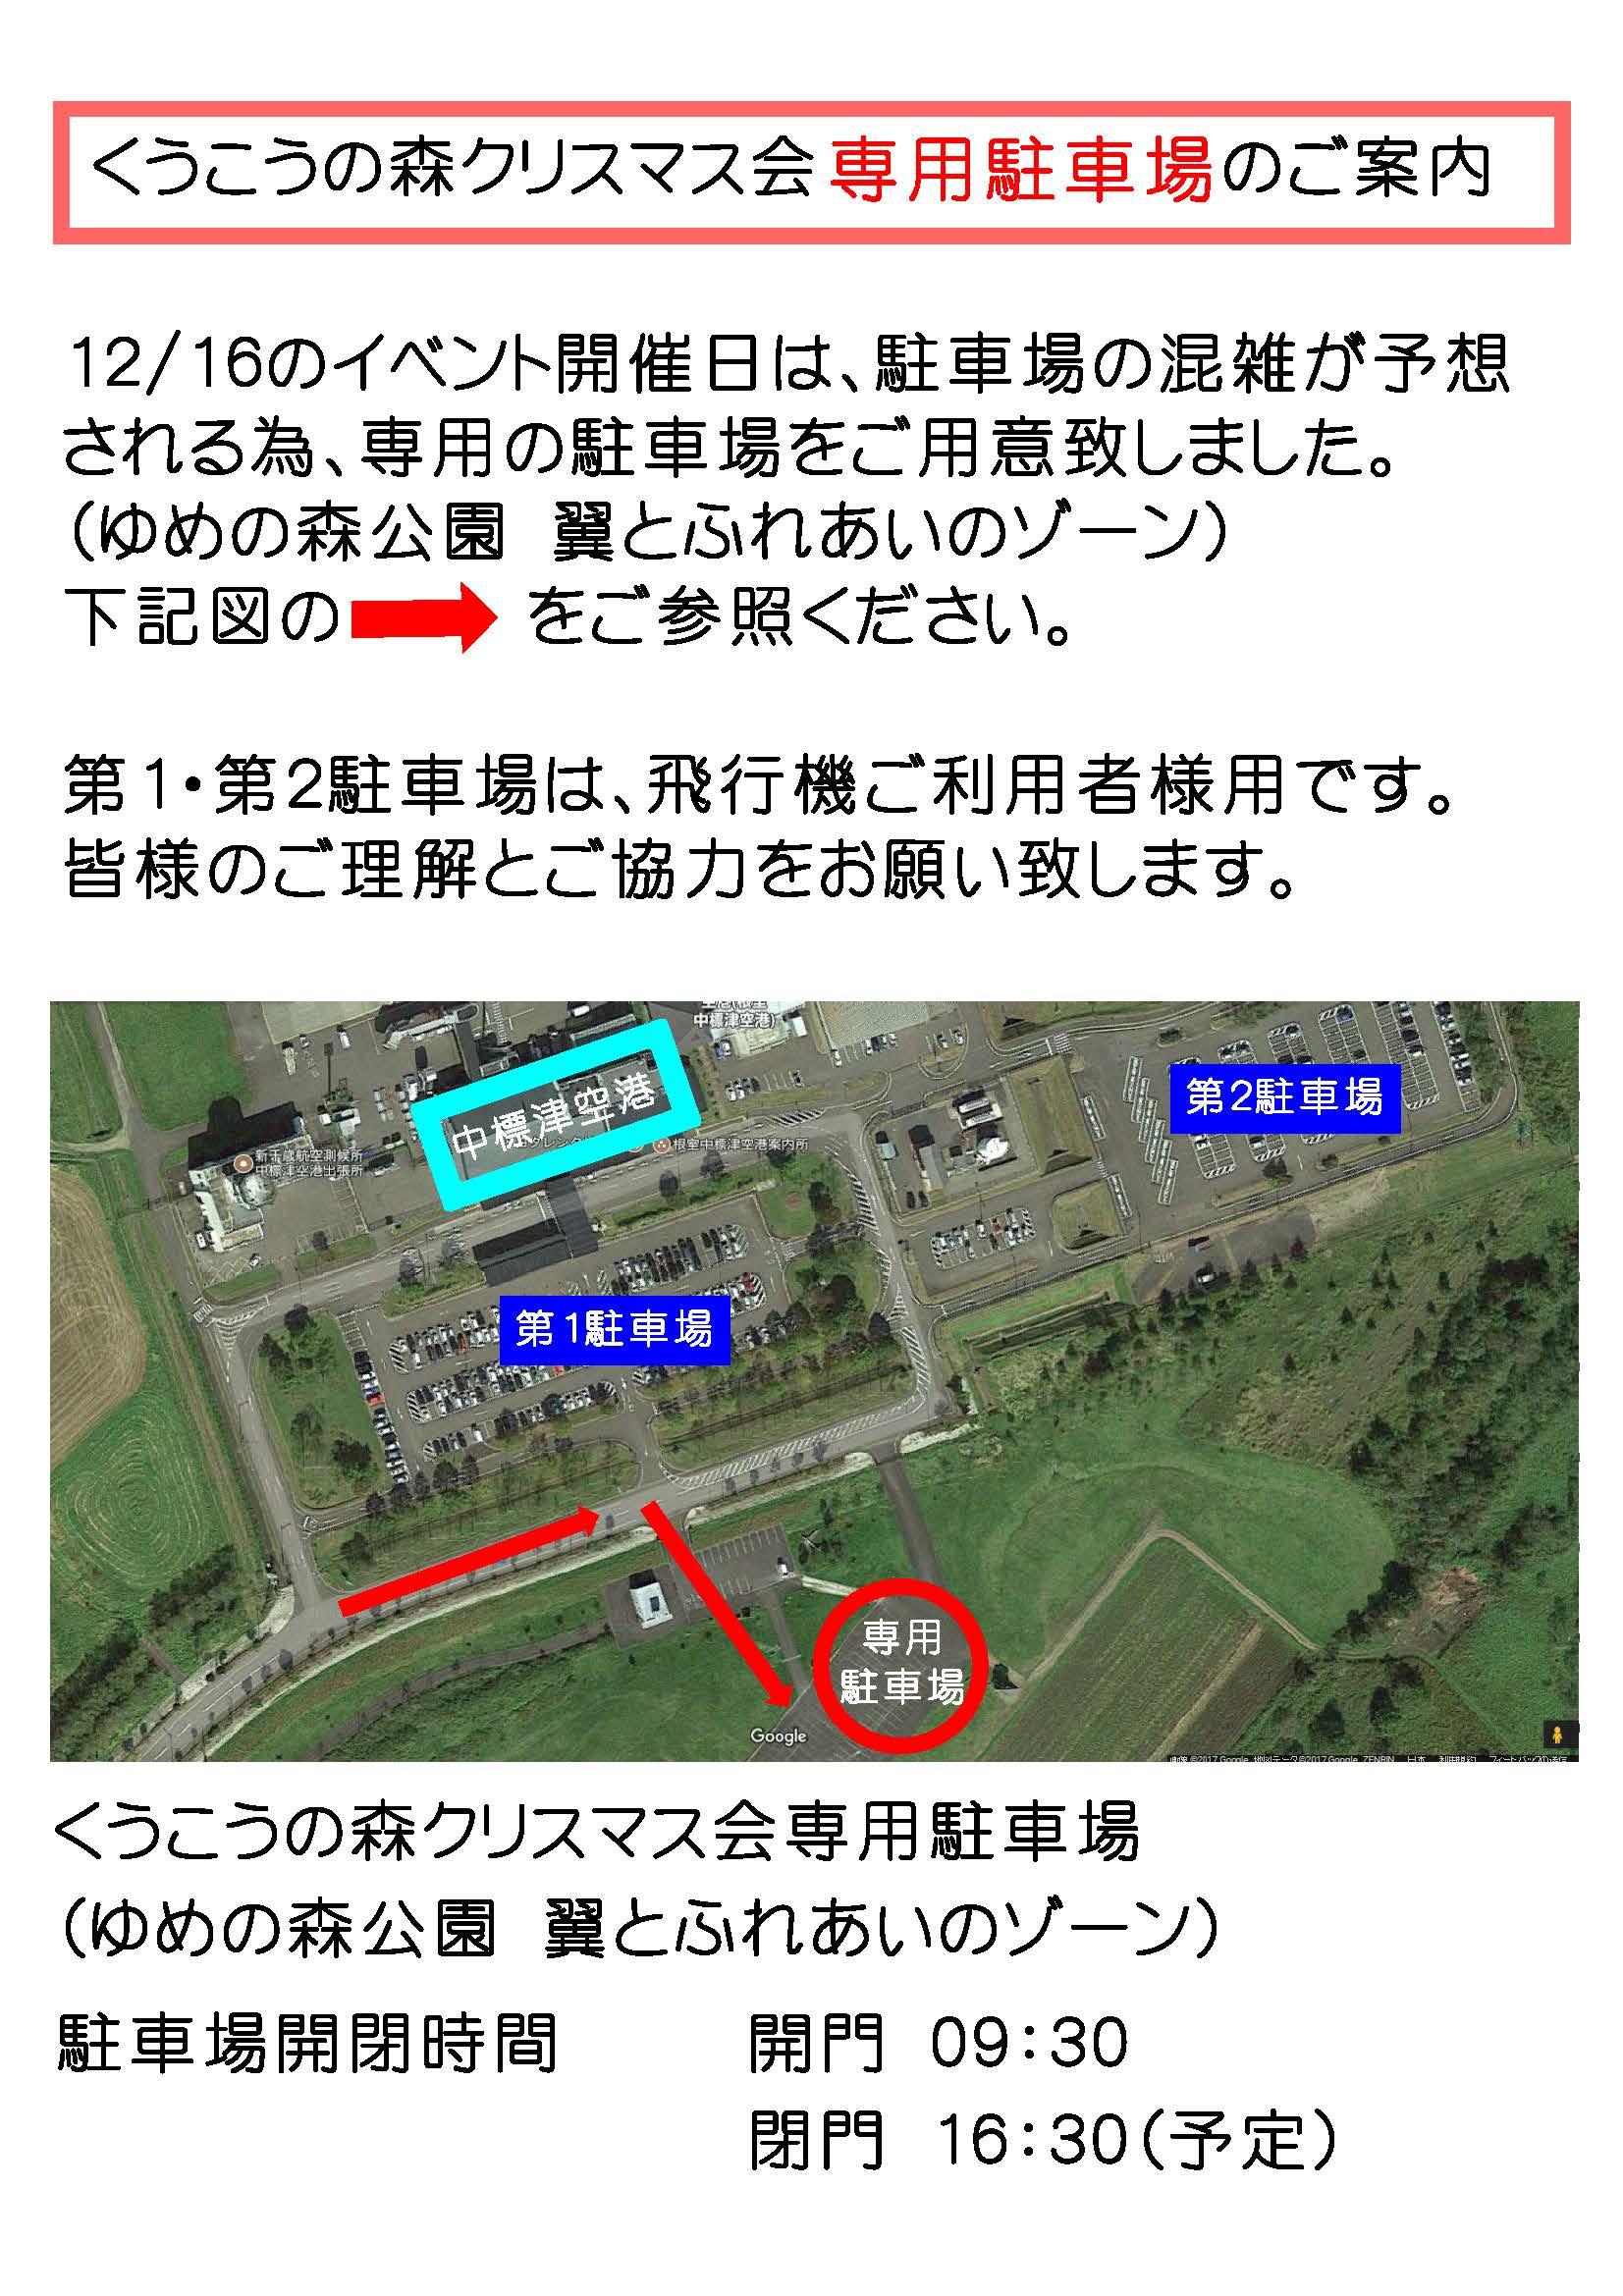 http://www.nakashibetsu-airport.jp/%E5%B0%82%E7%94%A8%E9%A7%90%E8%BB%8A%E5%A0%B4%E6%A1%88%E5%86%85%EF%BC%88%E6%9D%A5%E5%A0%B4%E8%80%85%E6%A7%98%E7%94%A8%EF%BC%891.jpg